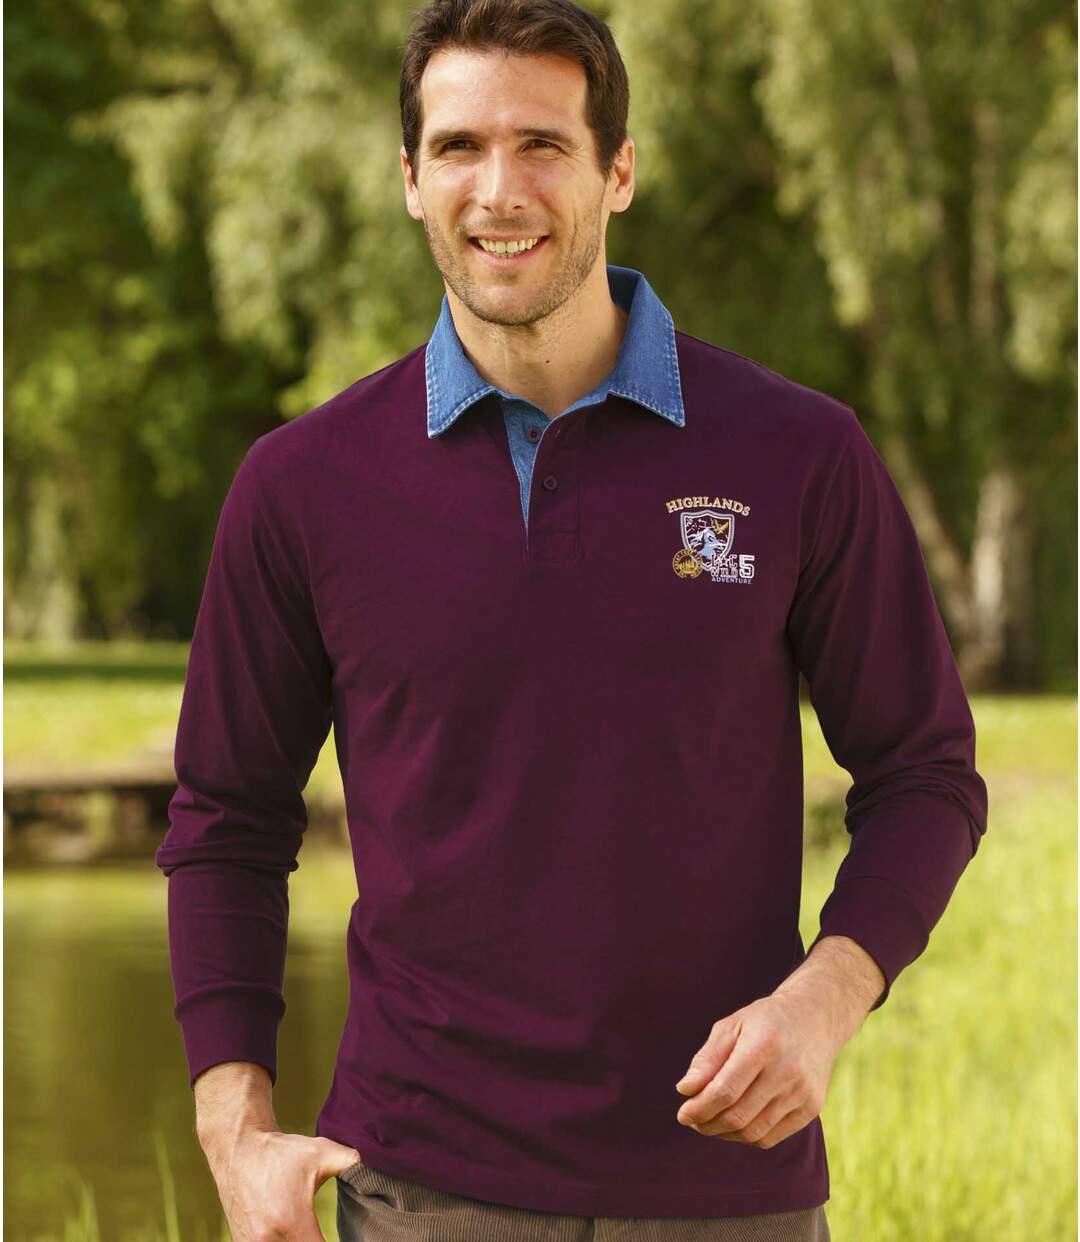 Men's Burgundy Polo Shirt with Denim Collar